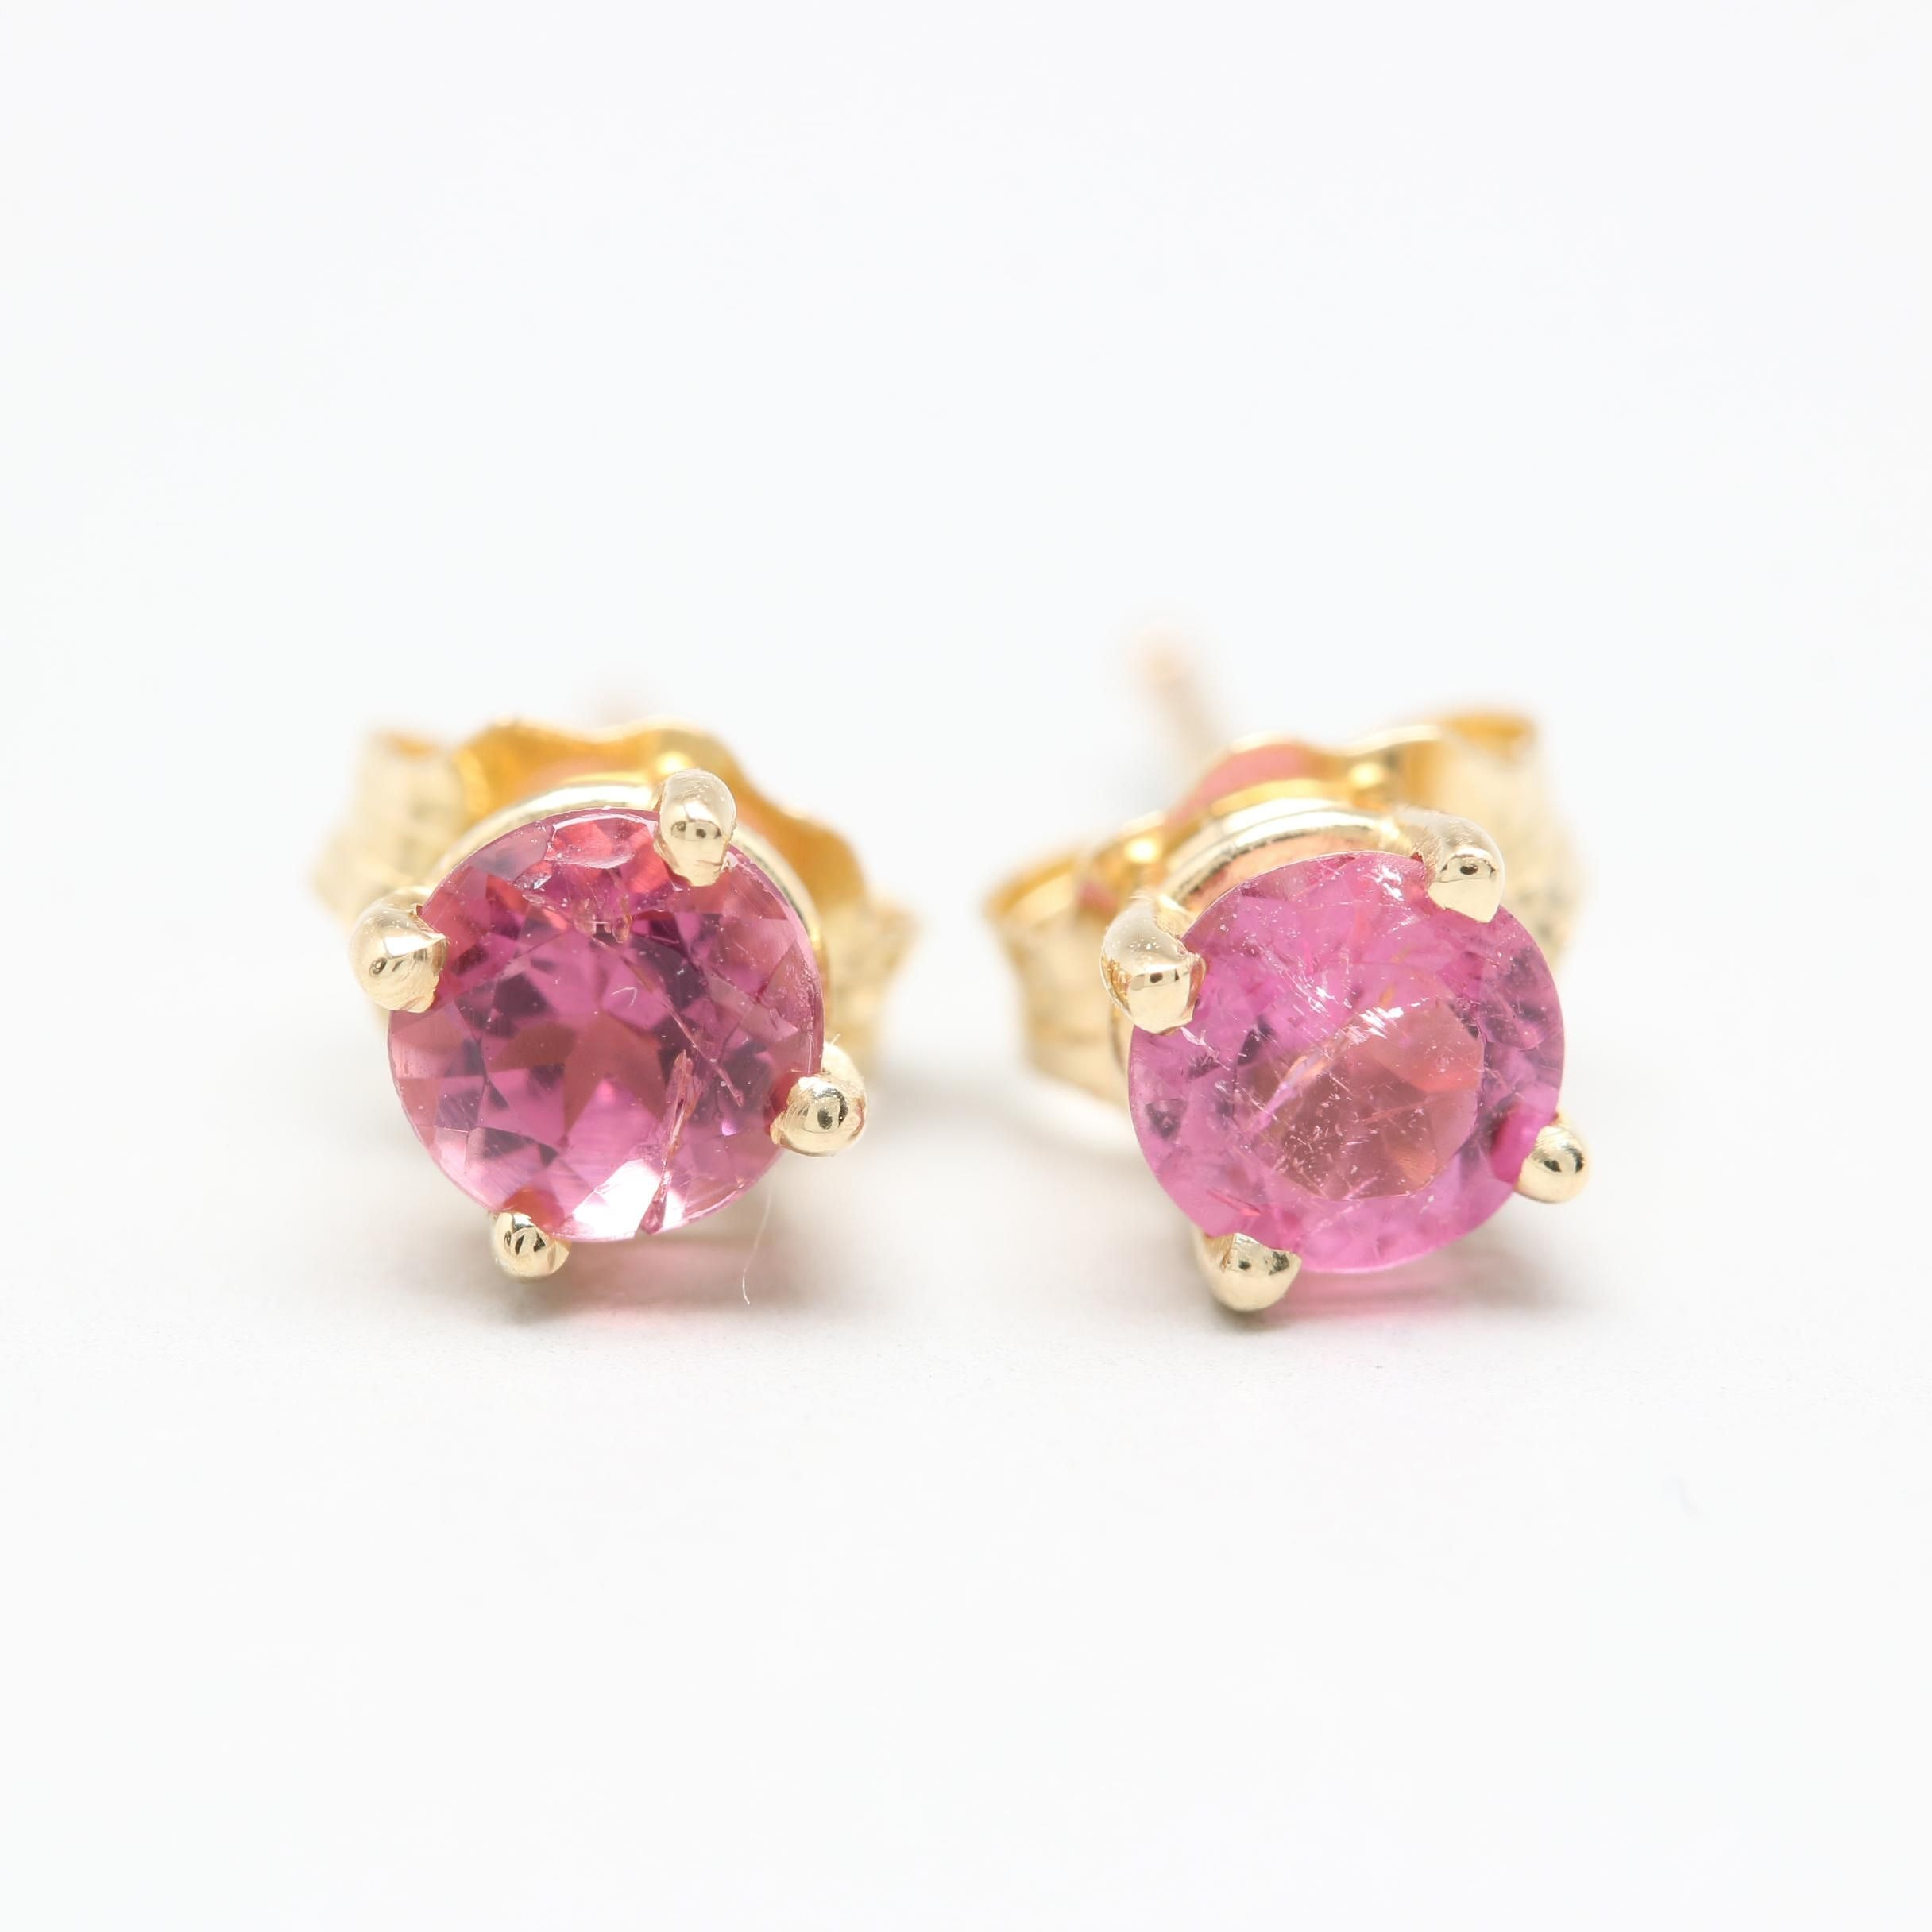 14K Yellow Gold Pink Tourmaline Stud Earrings